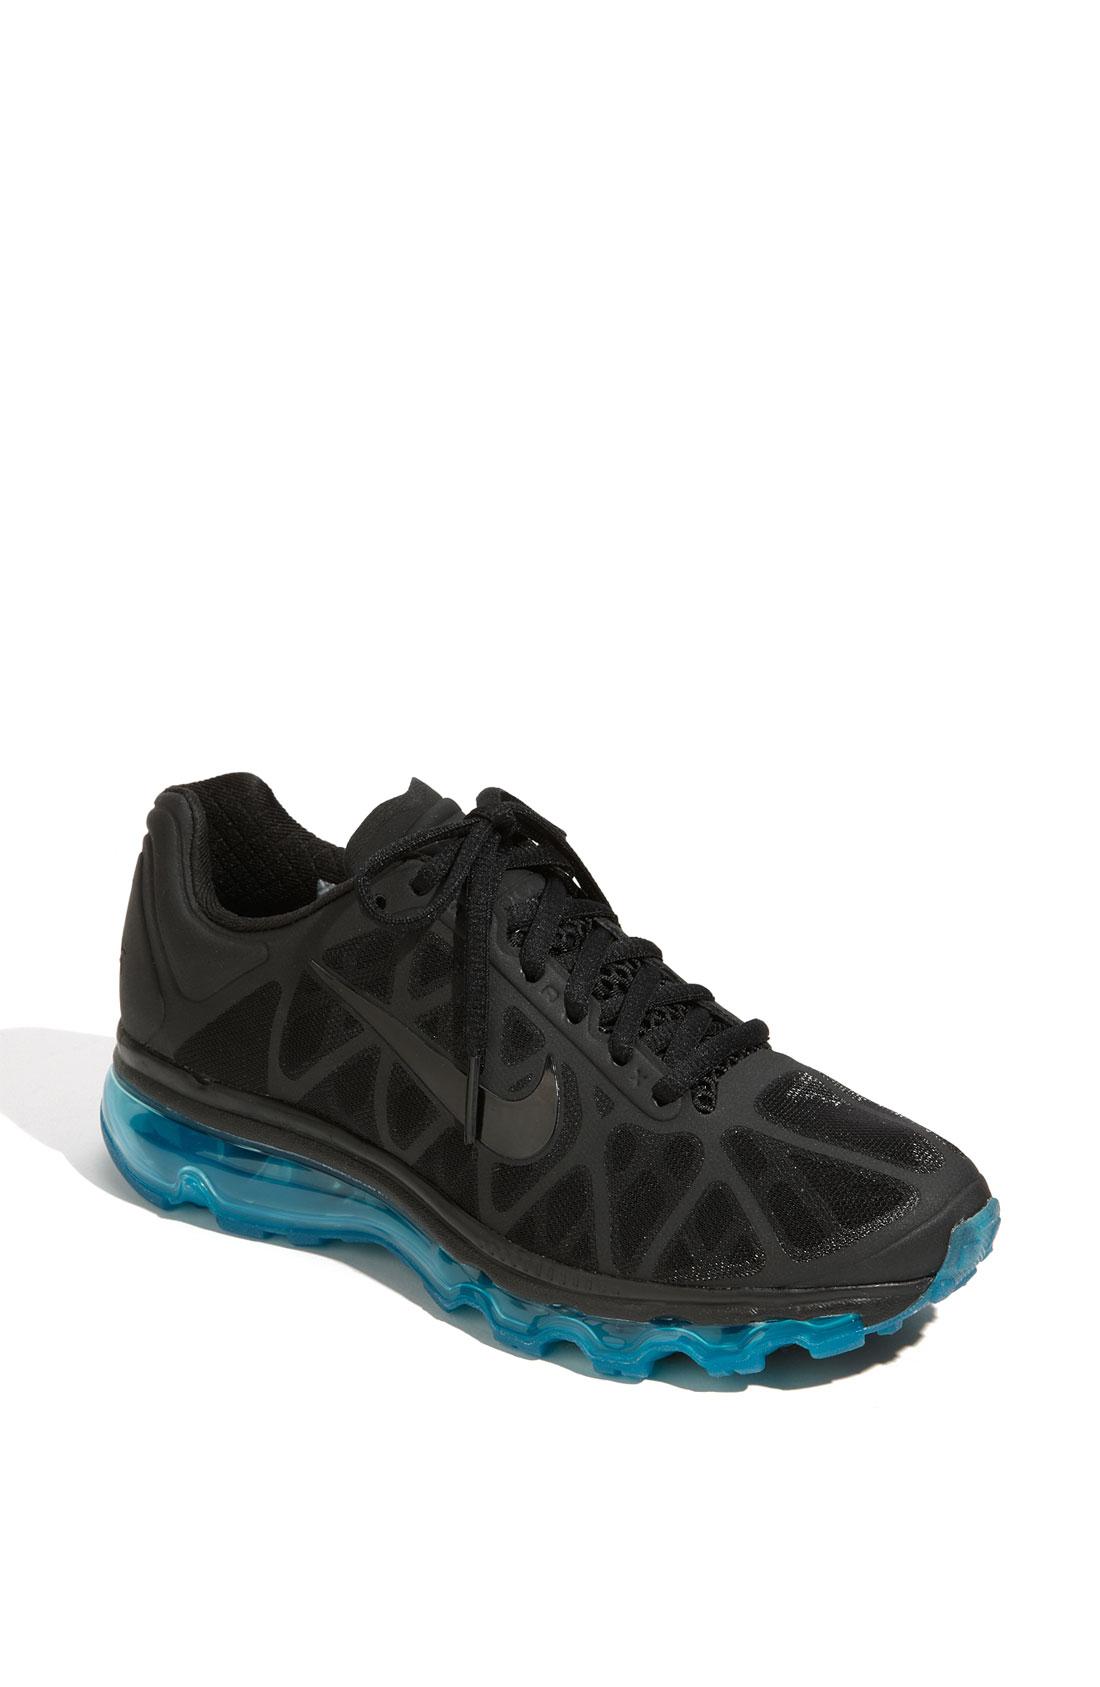 Model Shoes Nike Running Shoes Nike Turquoise  Wheretoget